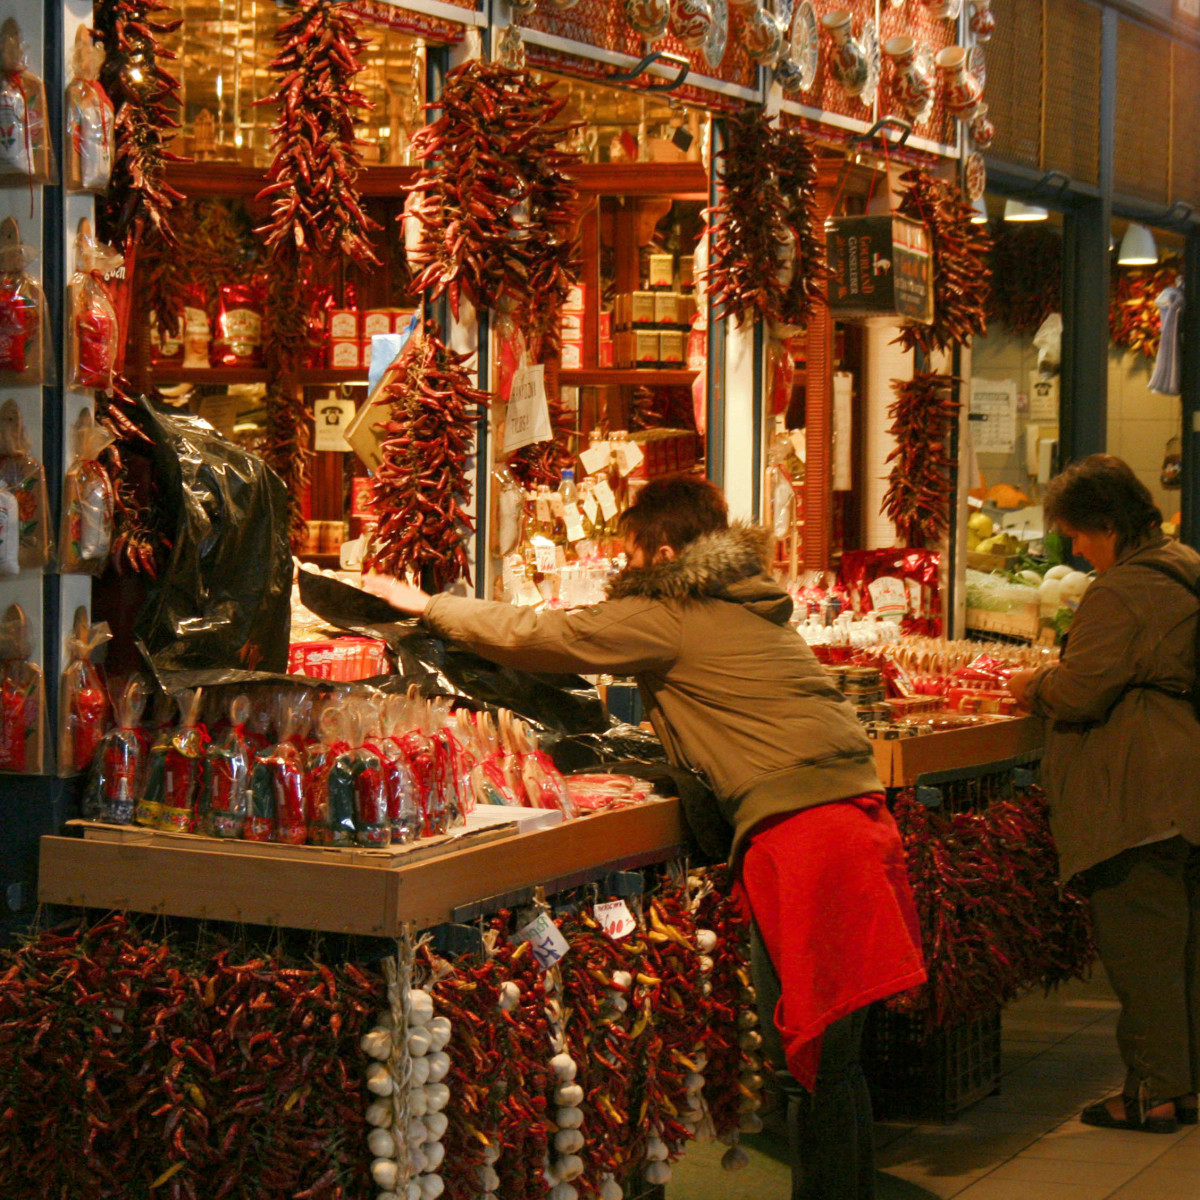 Paprika vendor in Budapest, Hungary